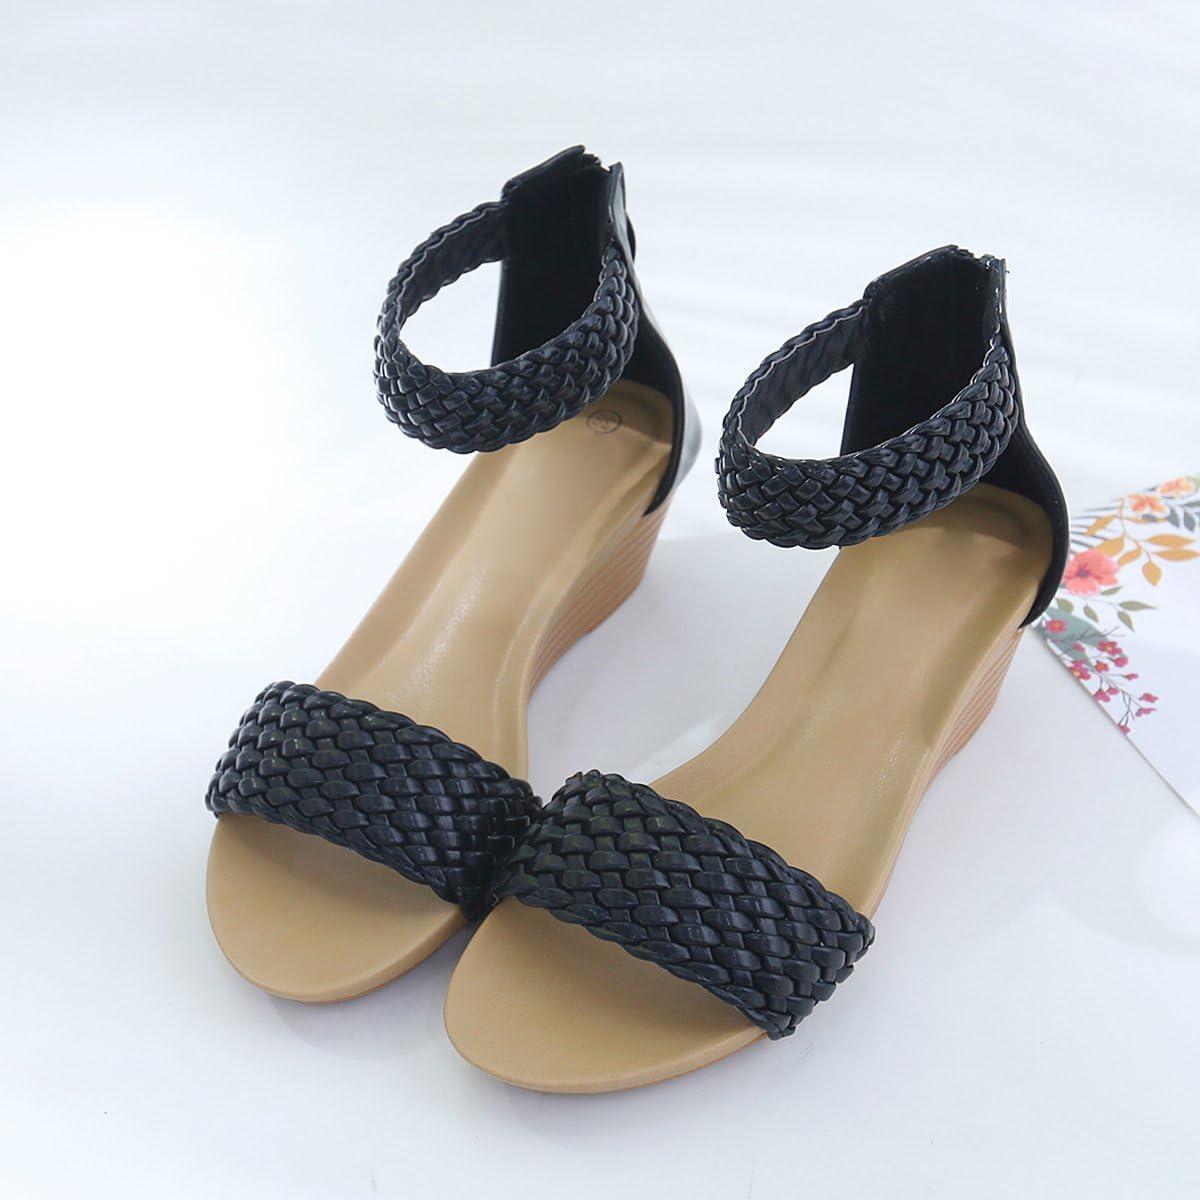 DeerYou Womens Wedges Sandals Casual Bohemia Summer Beach Ankel Strap Platform Heel Sandals